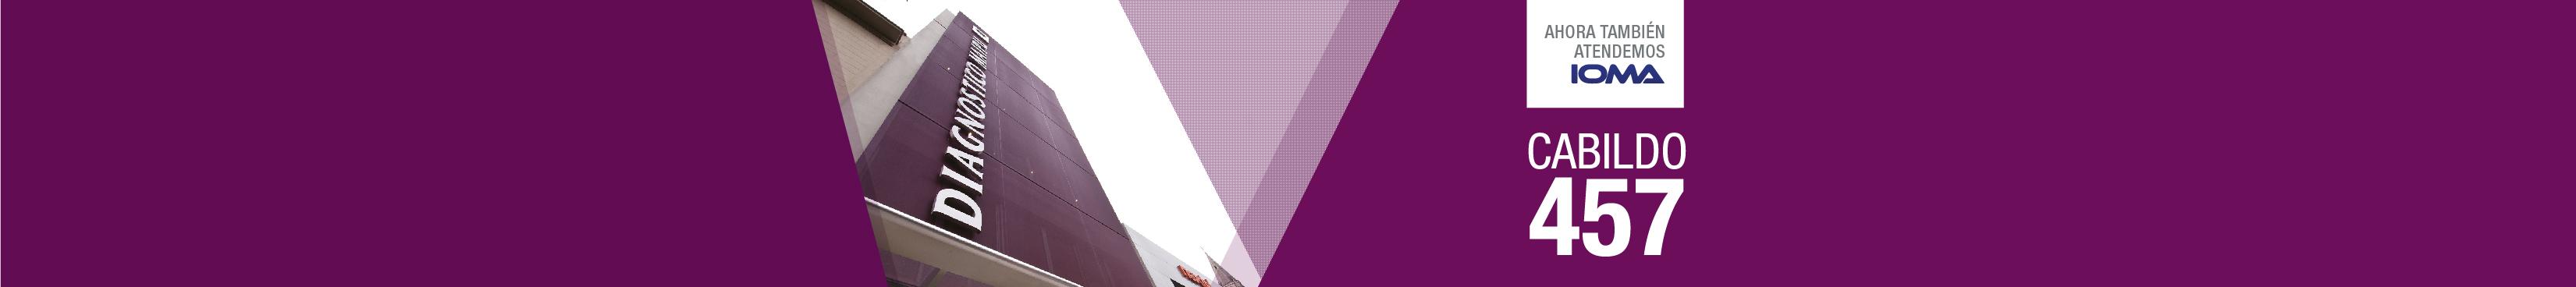 Banner_Web_IOMA_cabildo-01